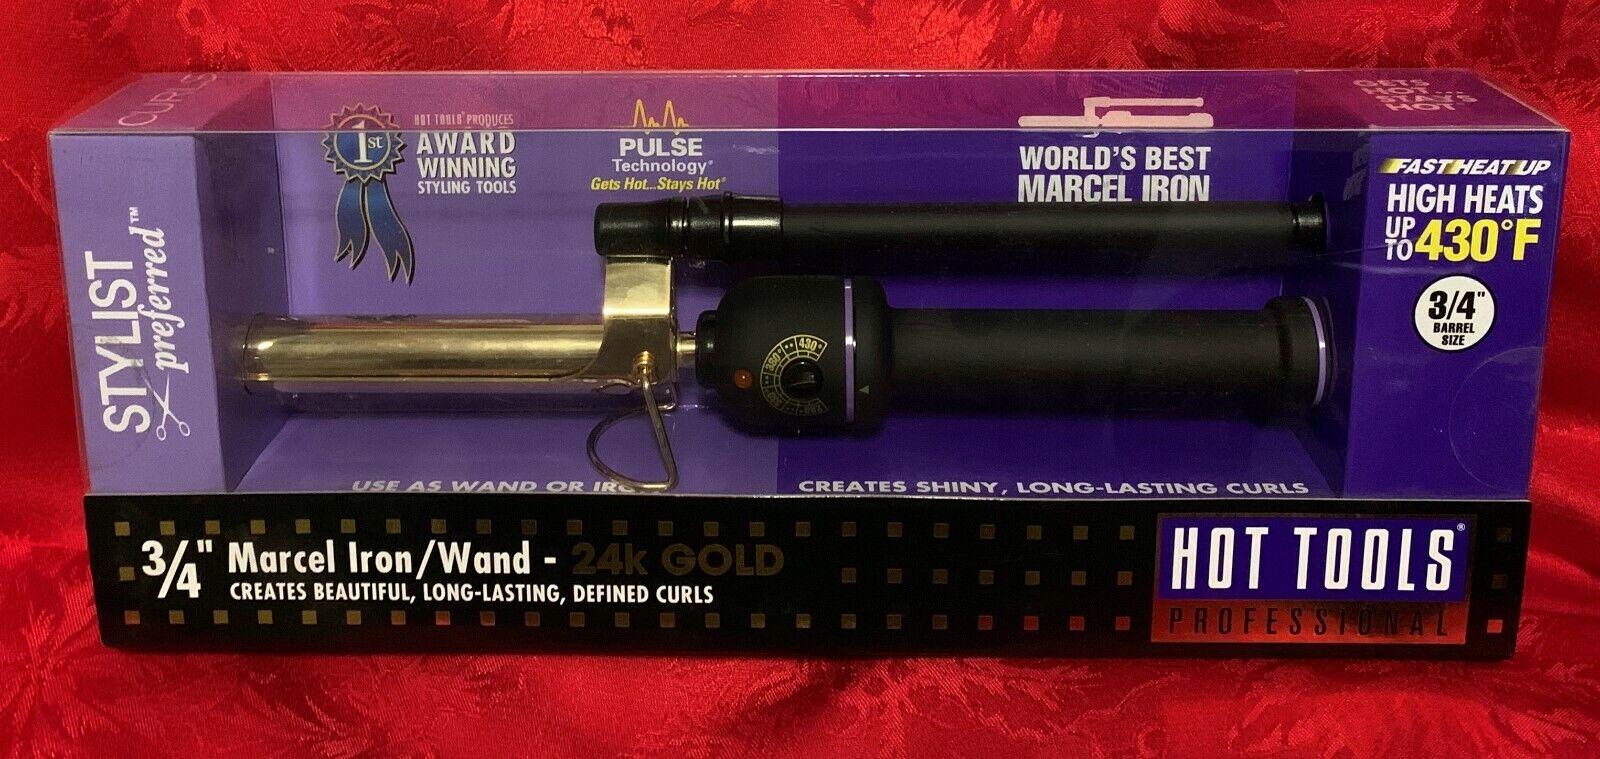 "Hot Tools Salon Curling Iron 24k Gold - 3/4"" Model 1101"